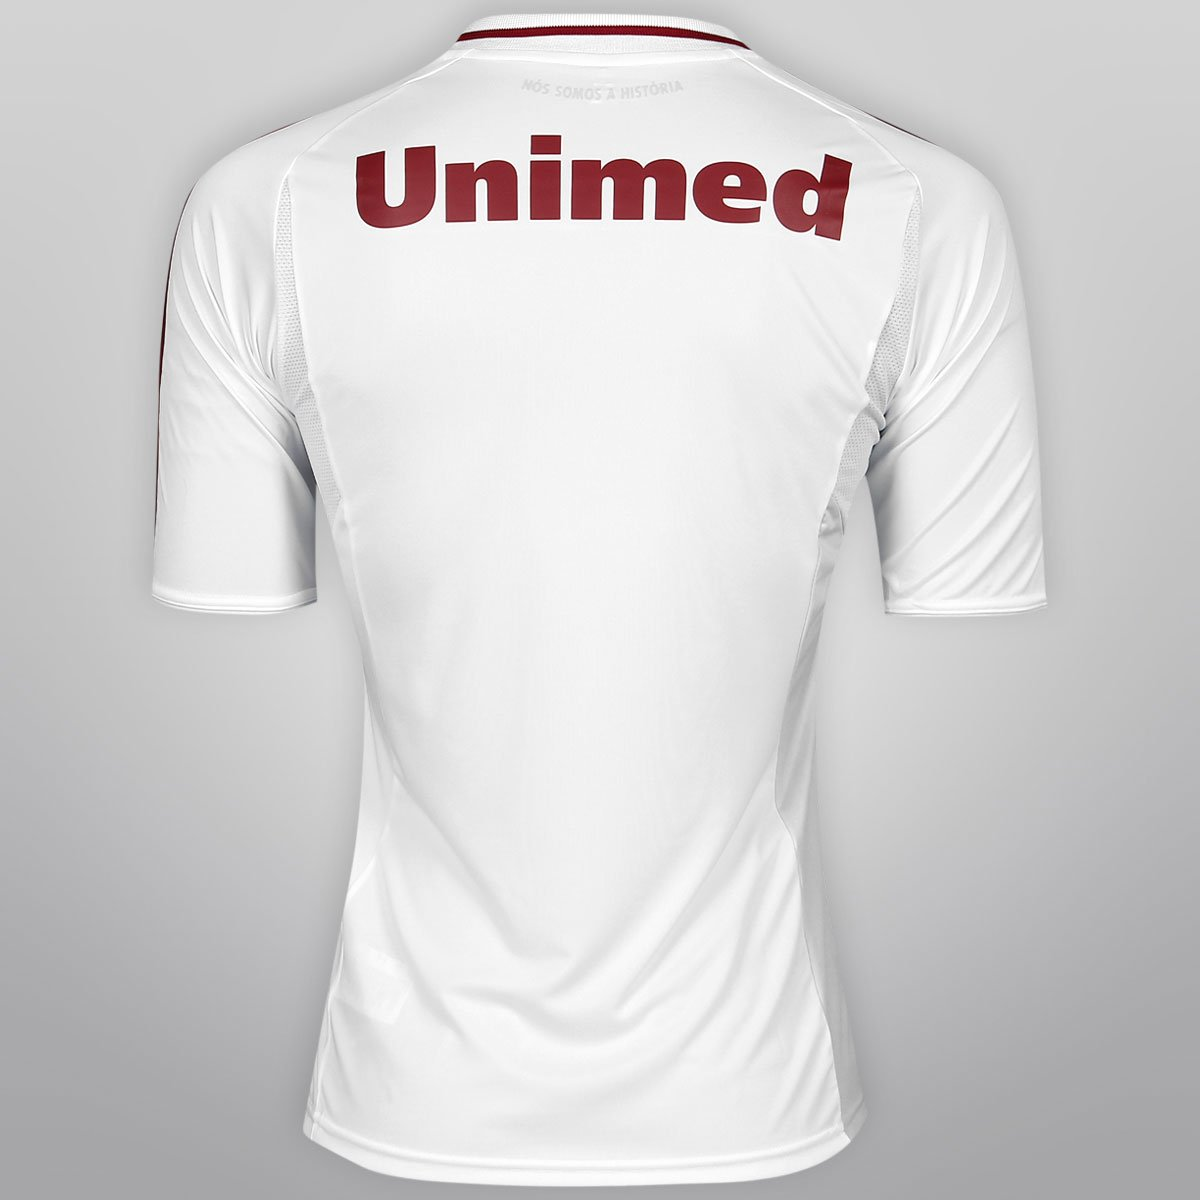 ... Camisa Adidas Fluminense 12 13 s nº - 110 Anos - Ed. Limitada ... 3e0da7099a8a5